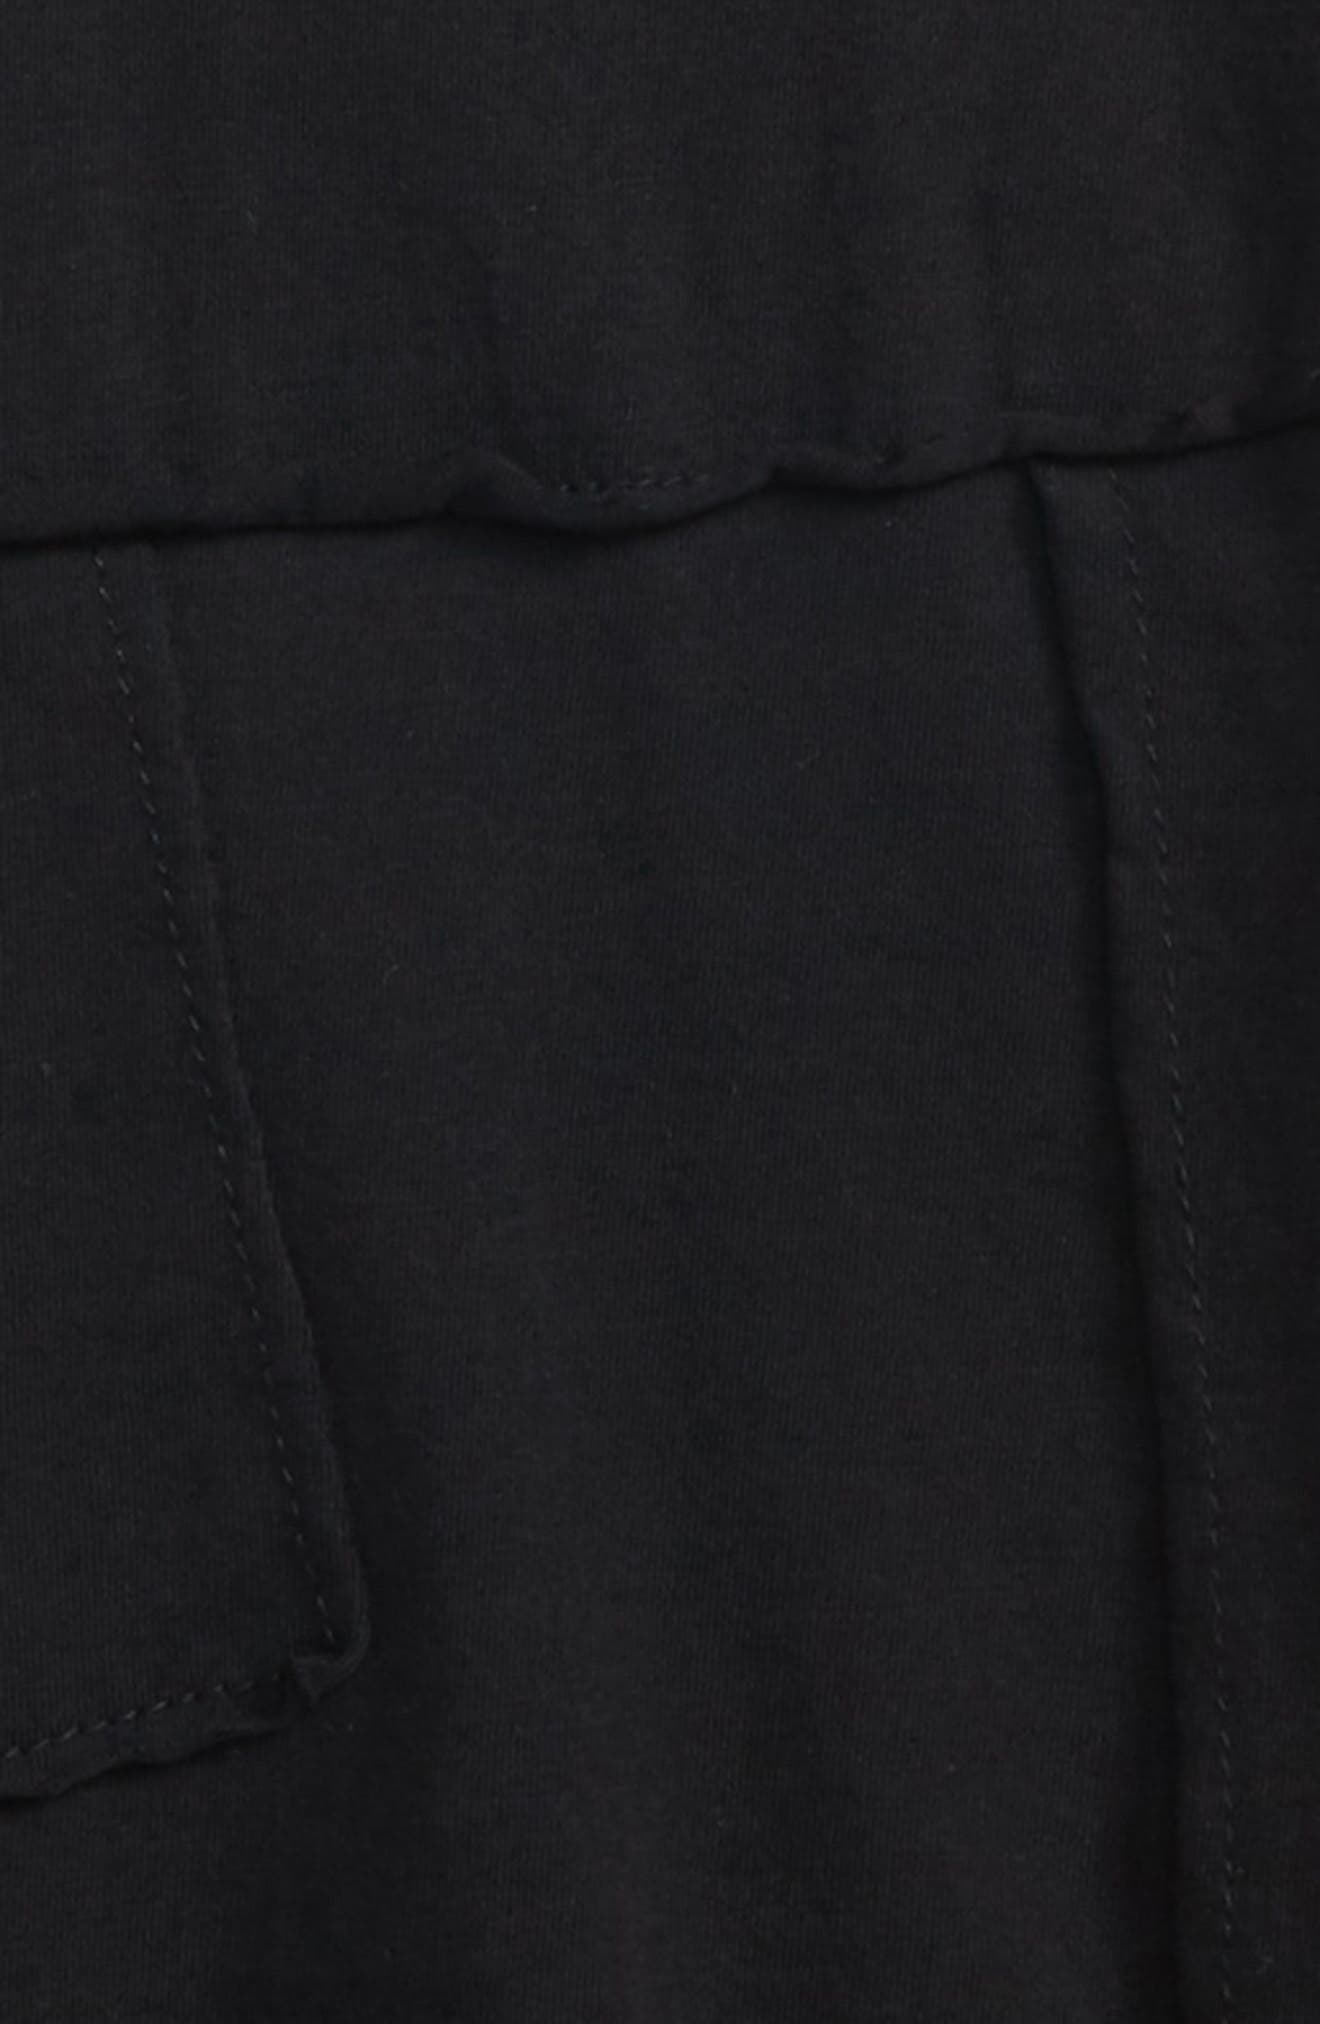 Patchwork Shirt,                             Alternate thumbnail 2, color,                             001